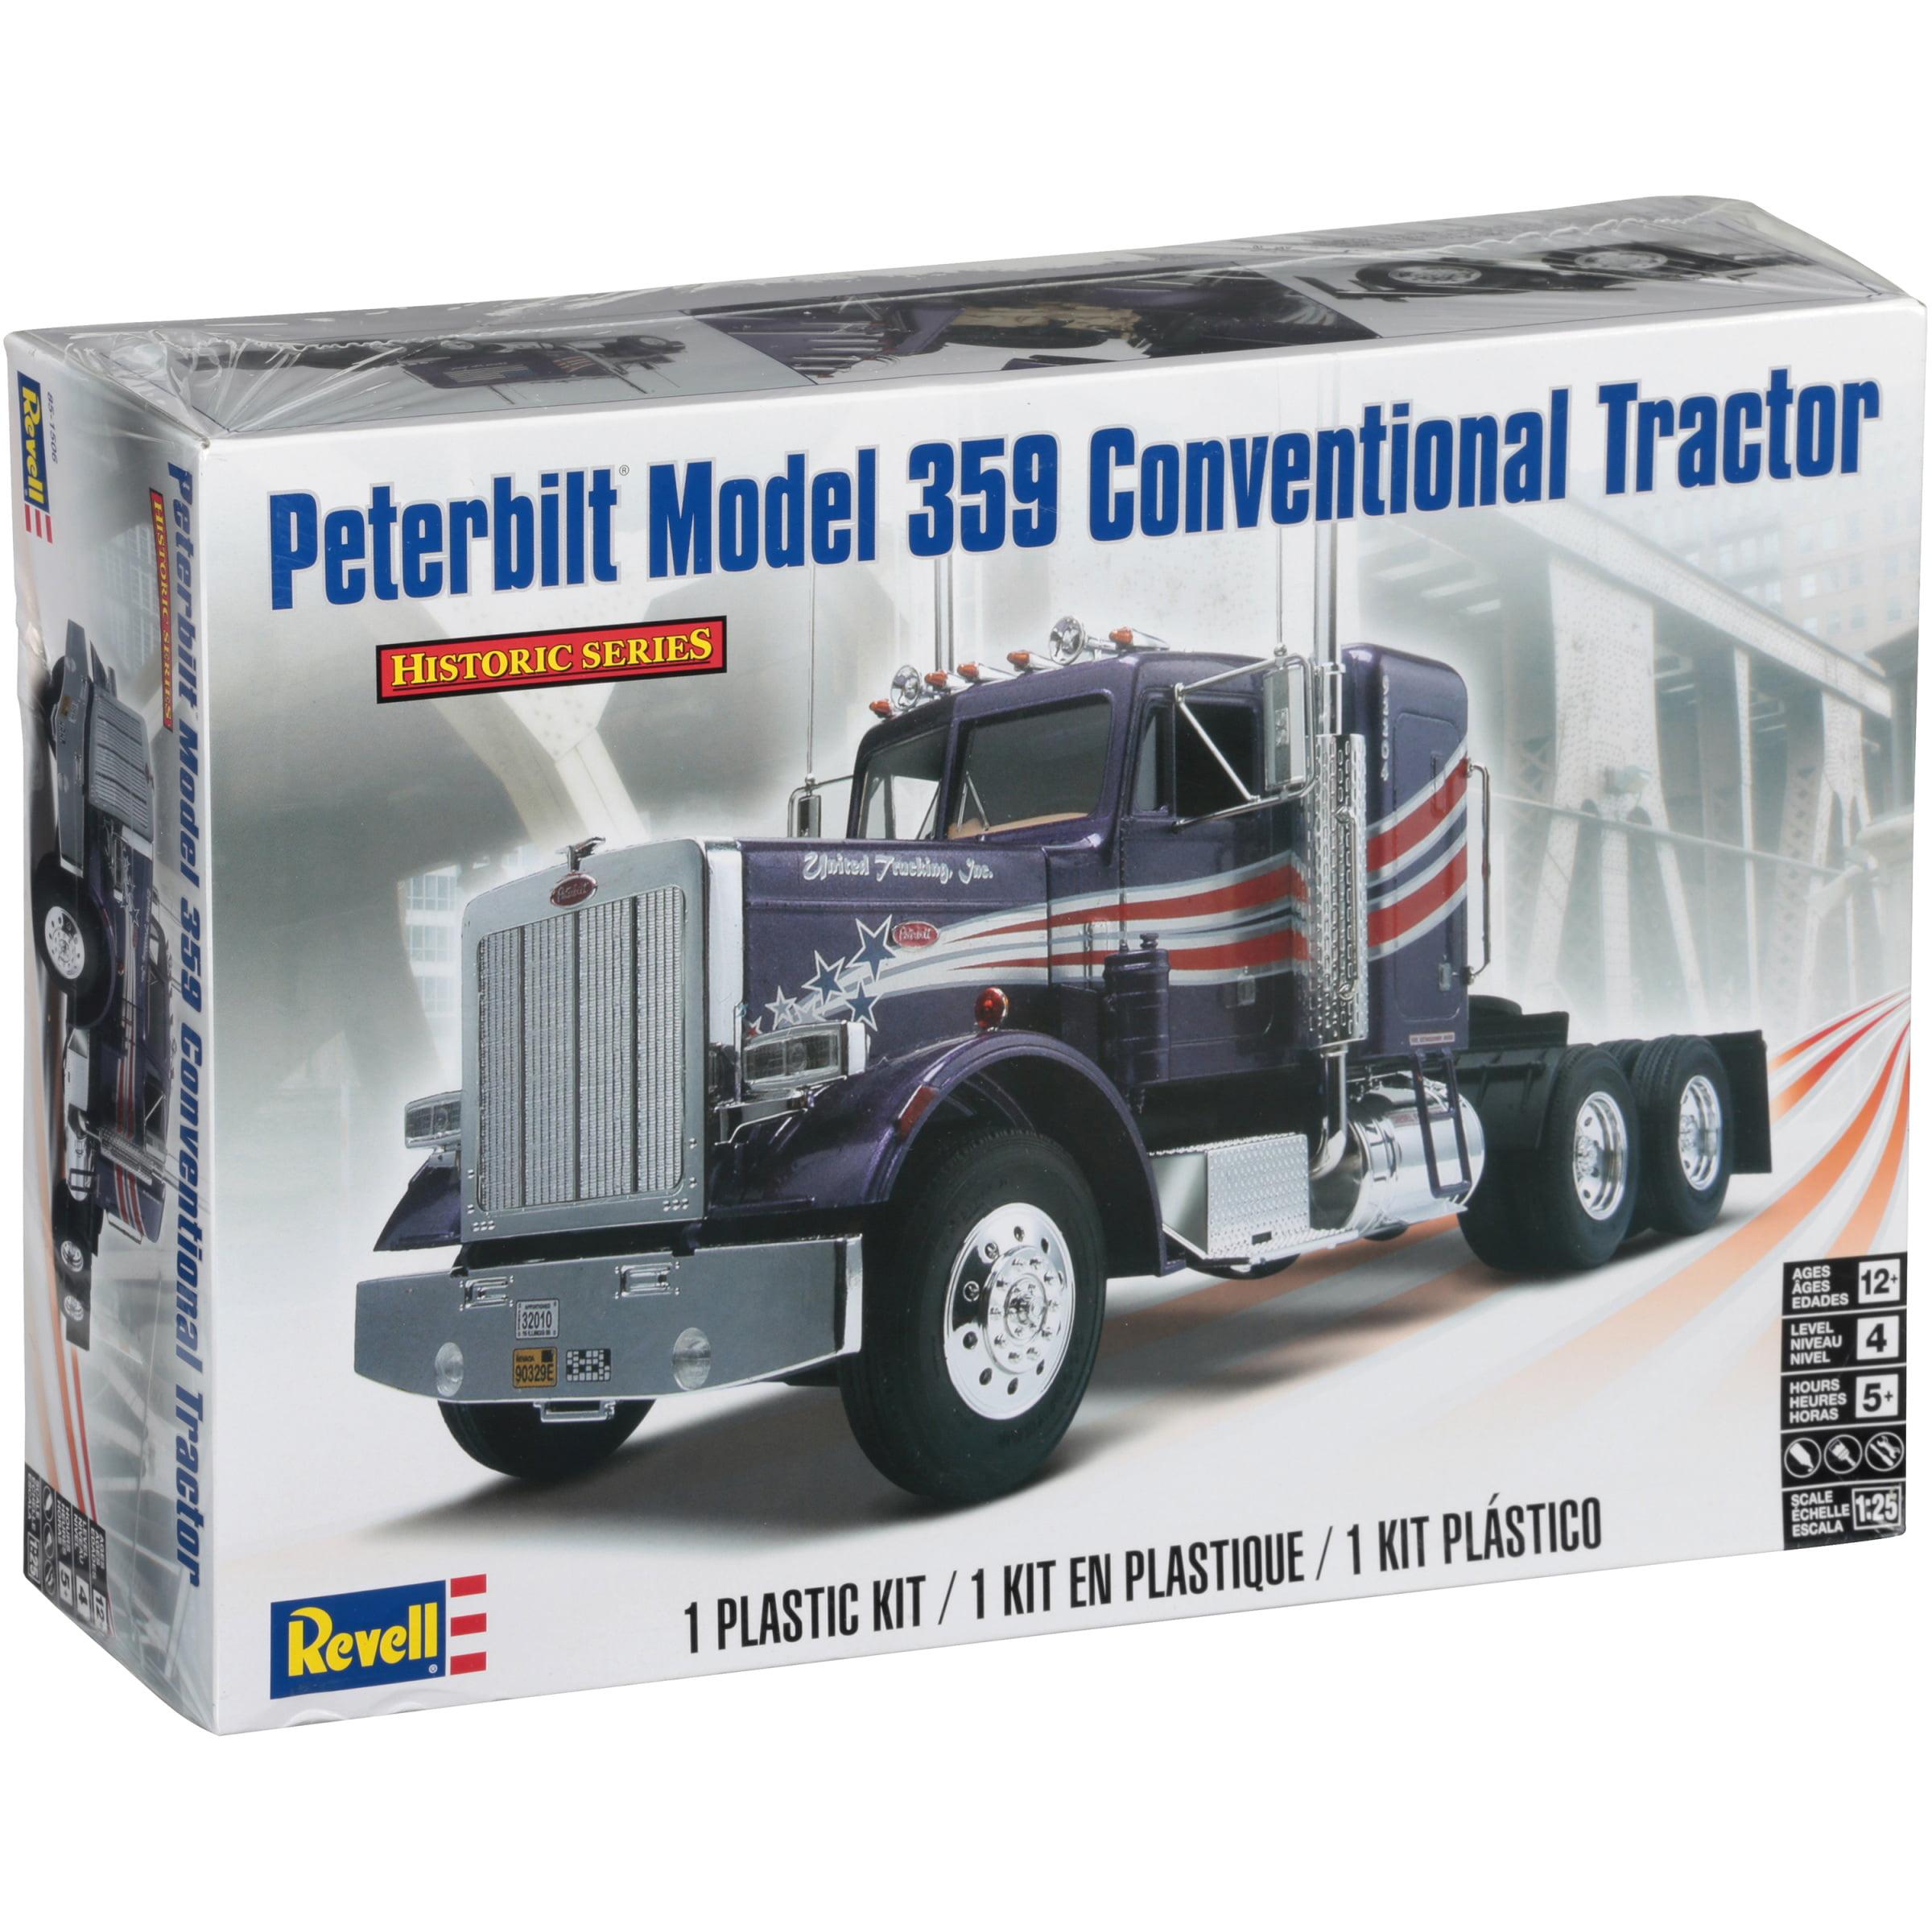 Revell peterbilt model 359 conventional tractor kit 116 pc box revell peterbilt model 359 conventional tractor kit 116 pc box walmart publicscrutiny Images